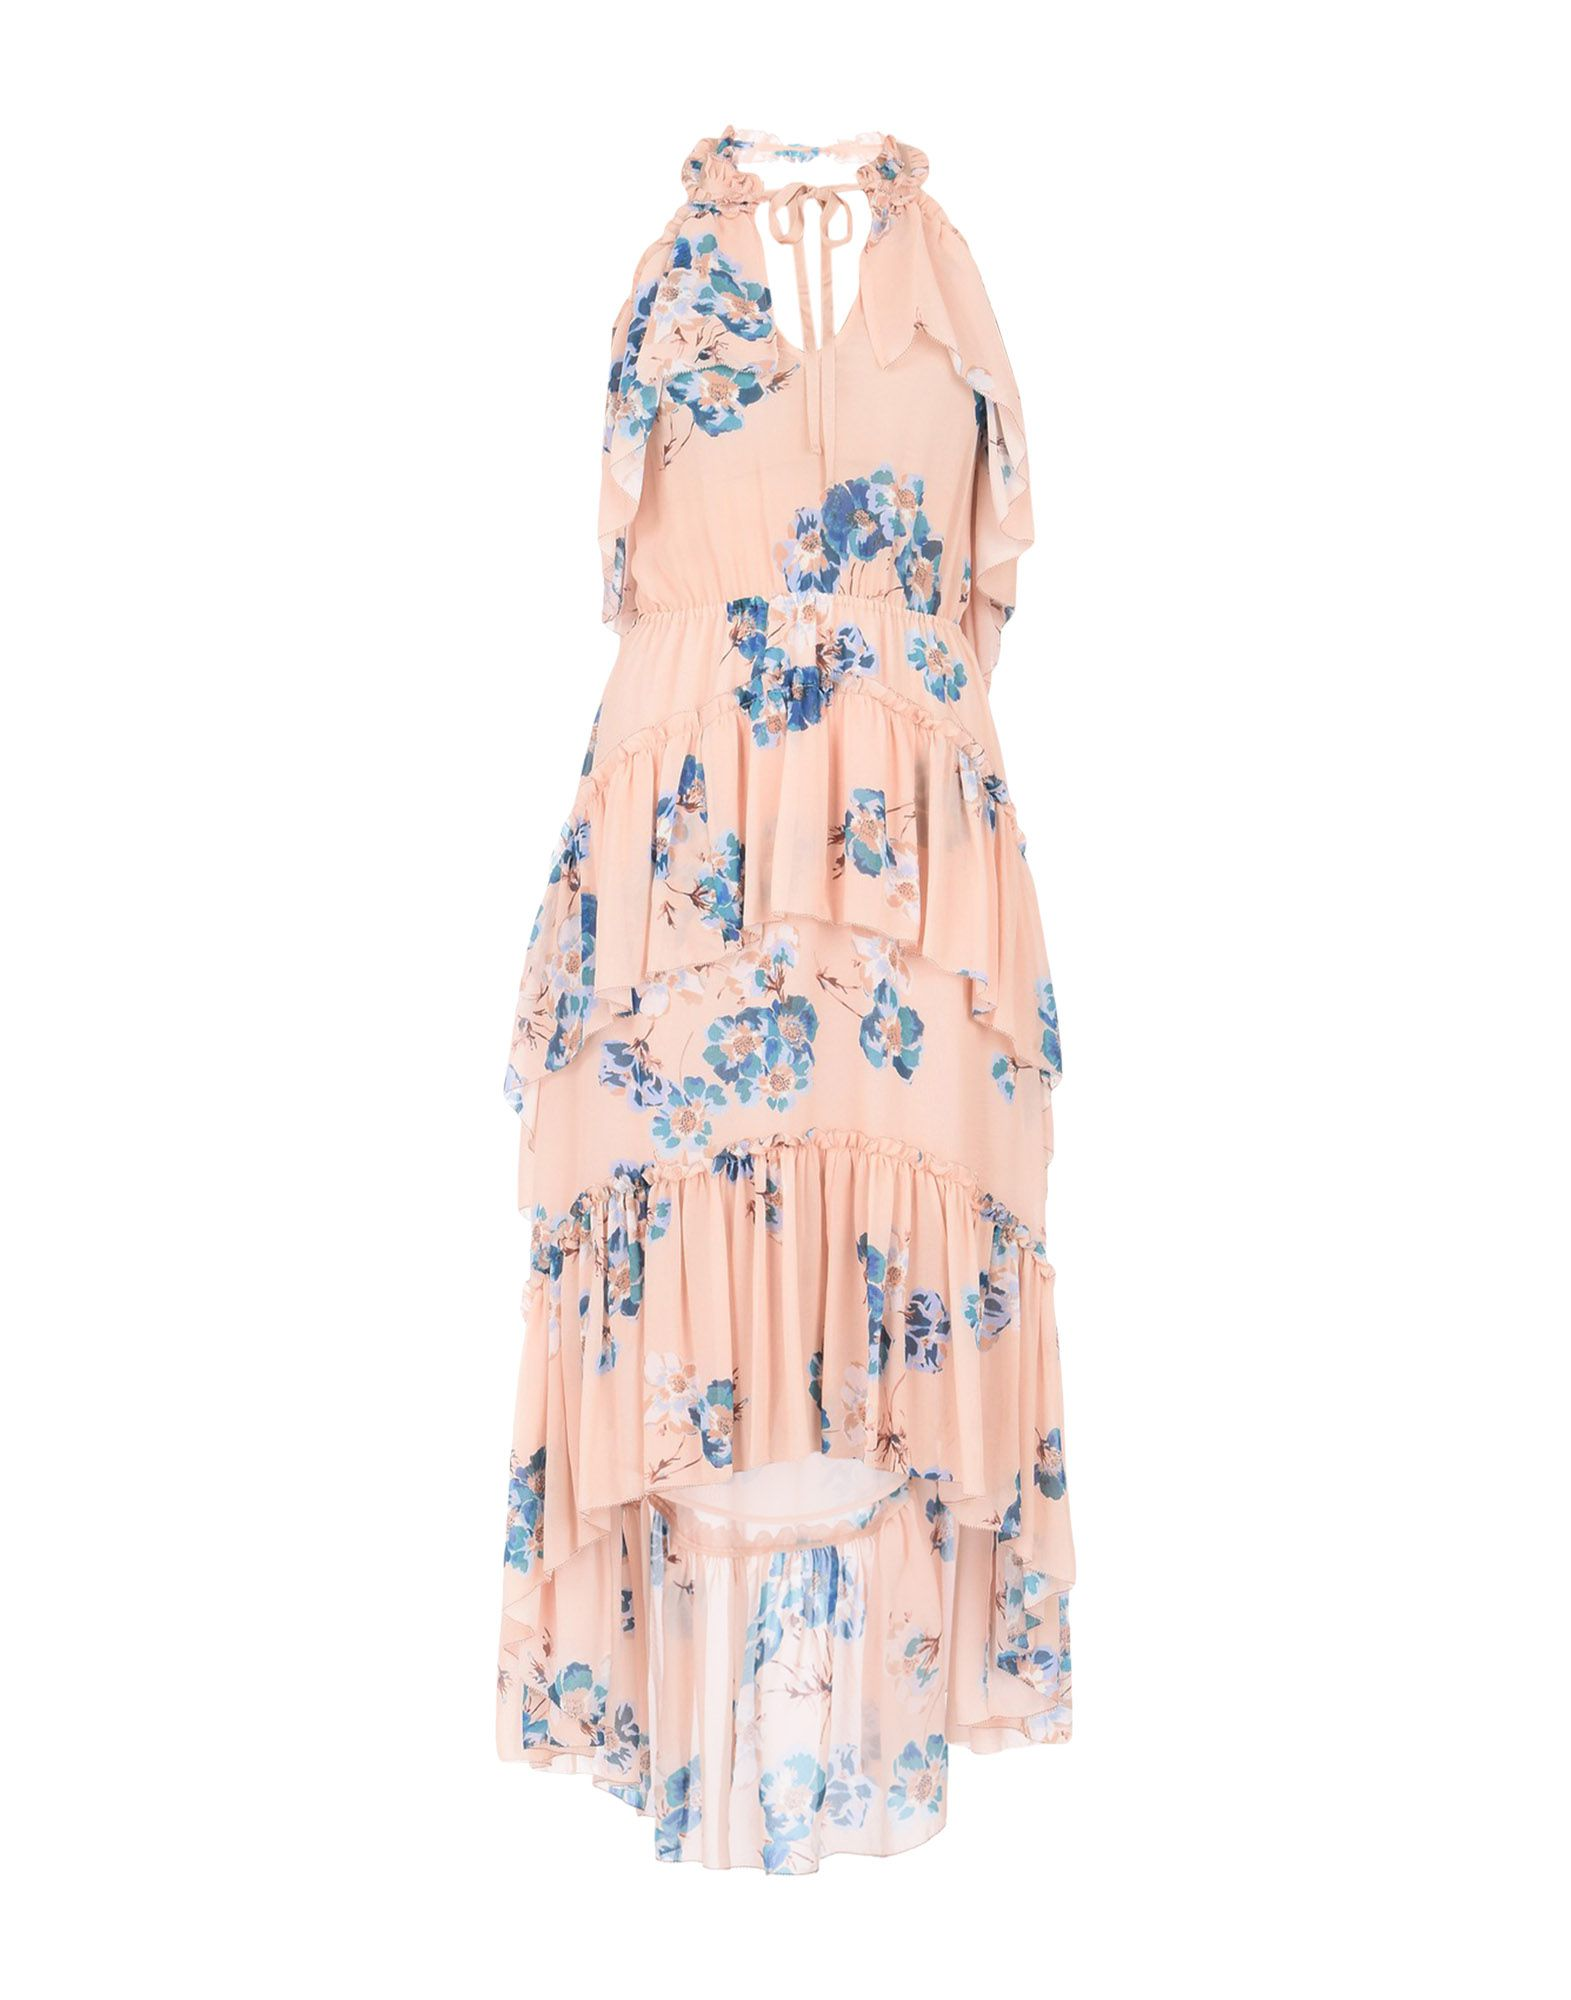 ULLA JOHNSON Платье длиной 3/4 пиджак ulla popken ulla popken ul002ewwcg77